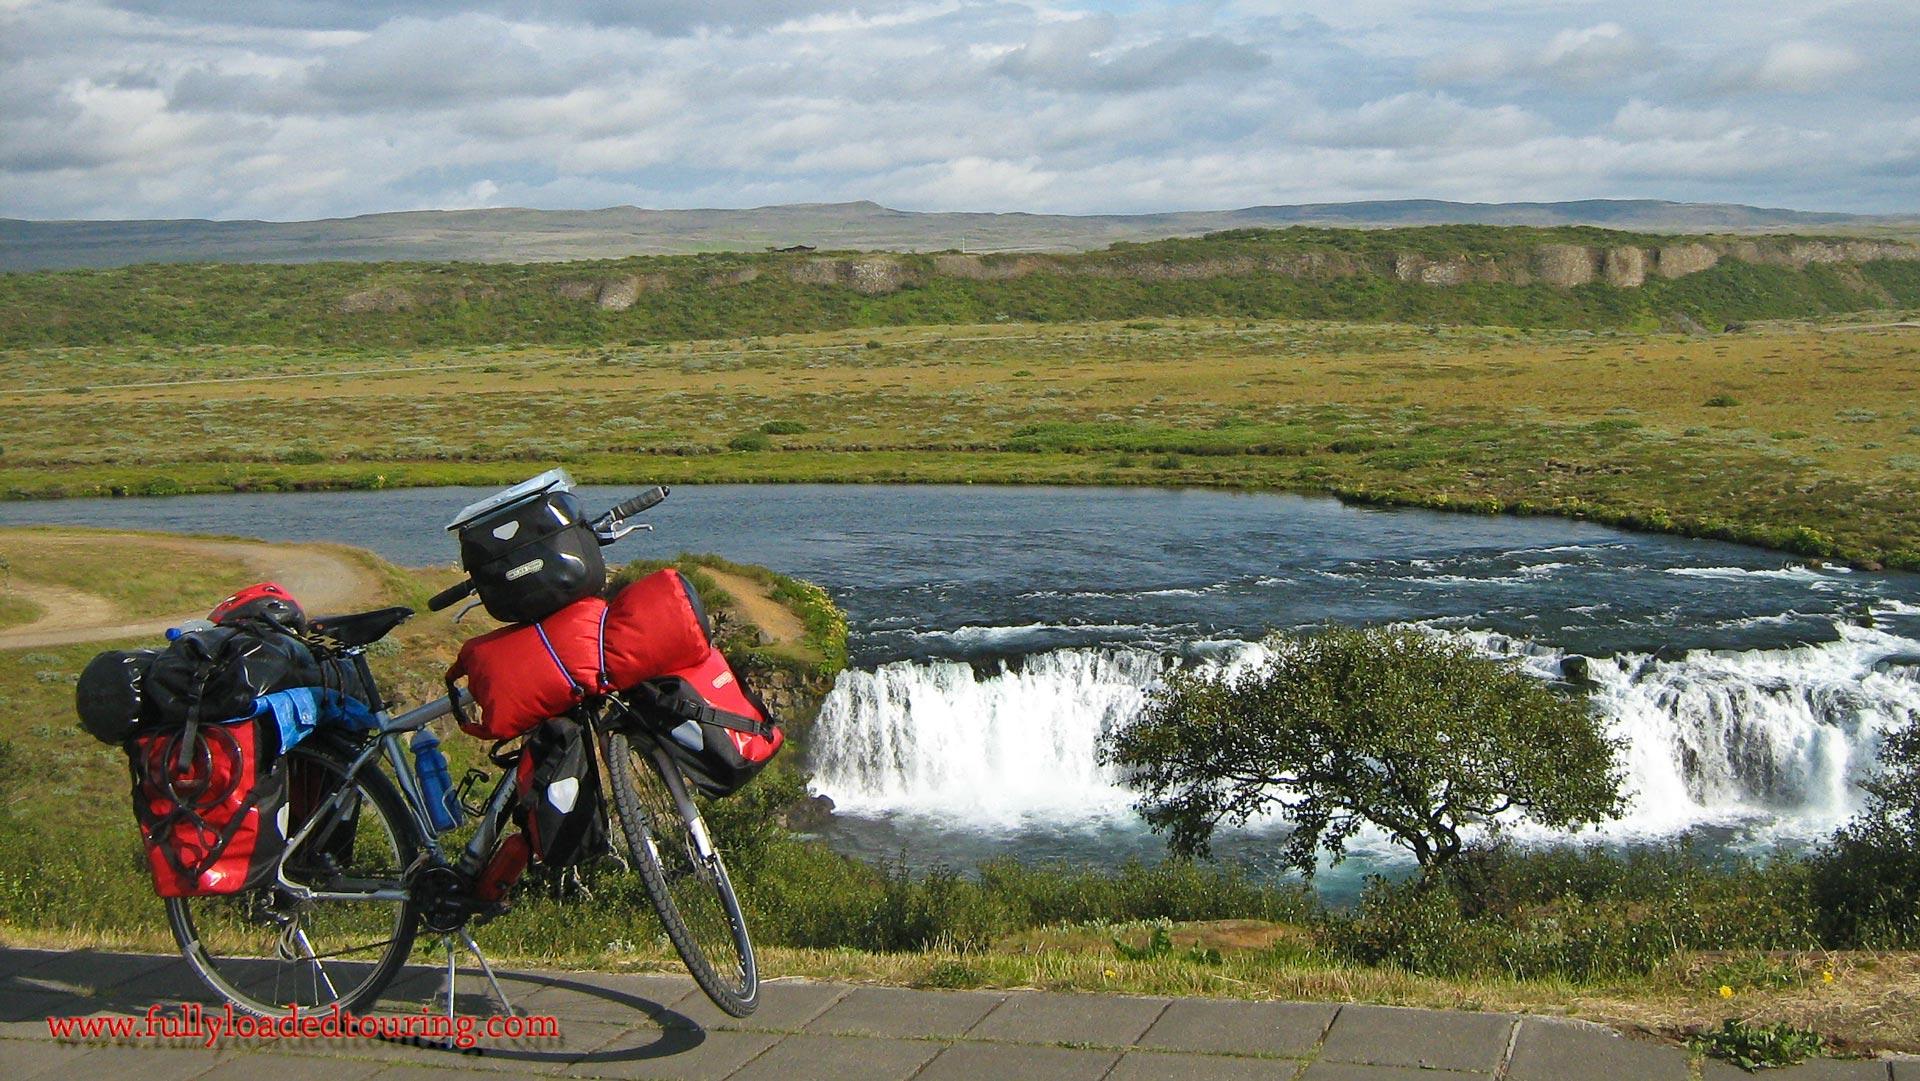 351    Pedro - Touring Iceland - Wheeler 6.3 touring bike